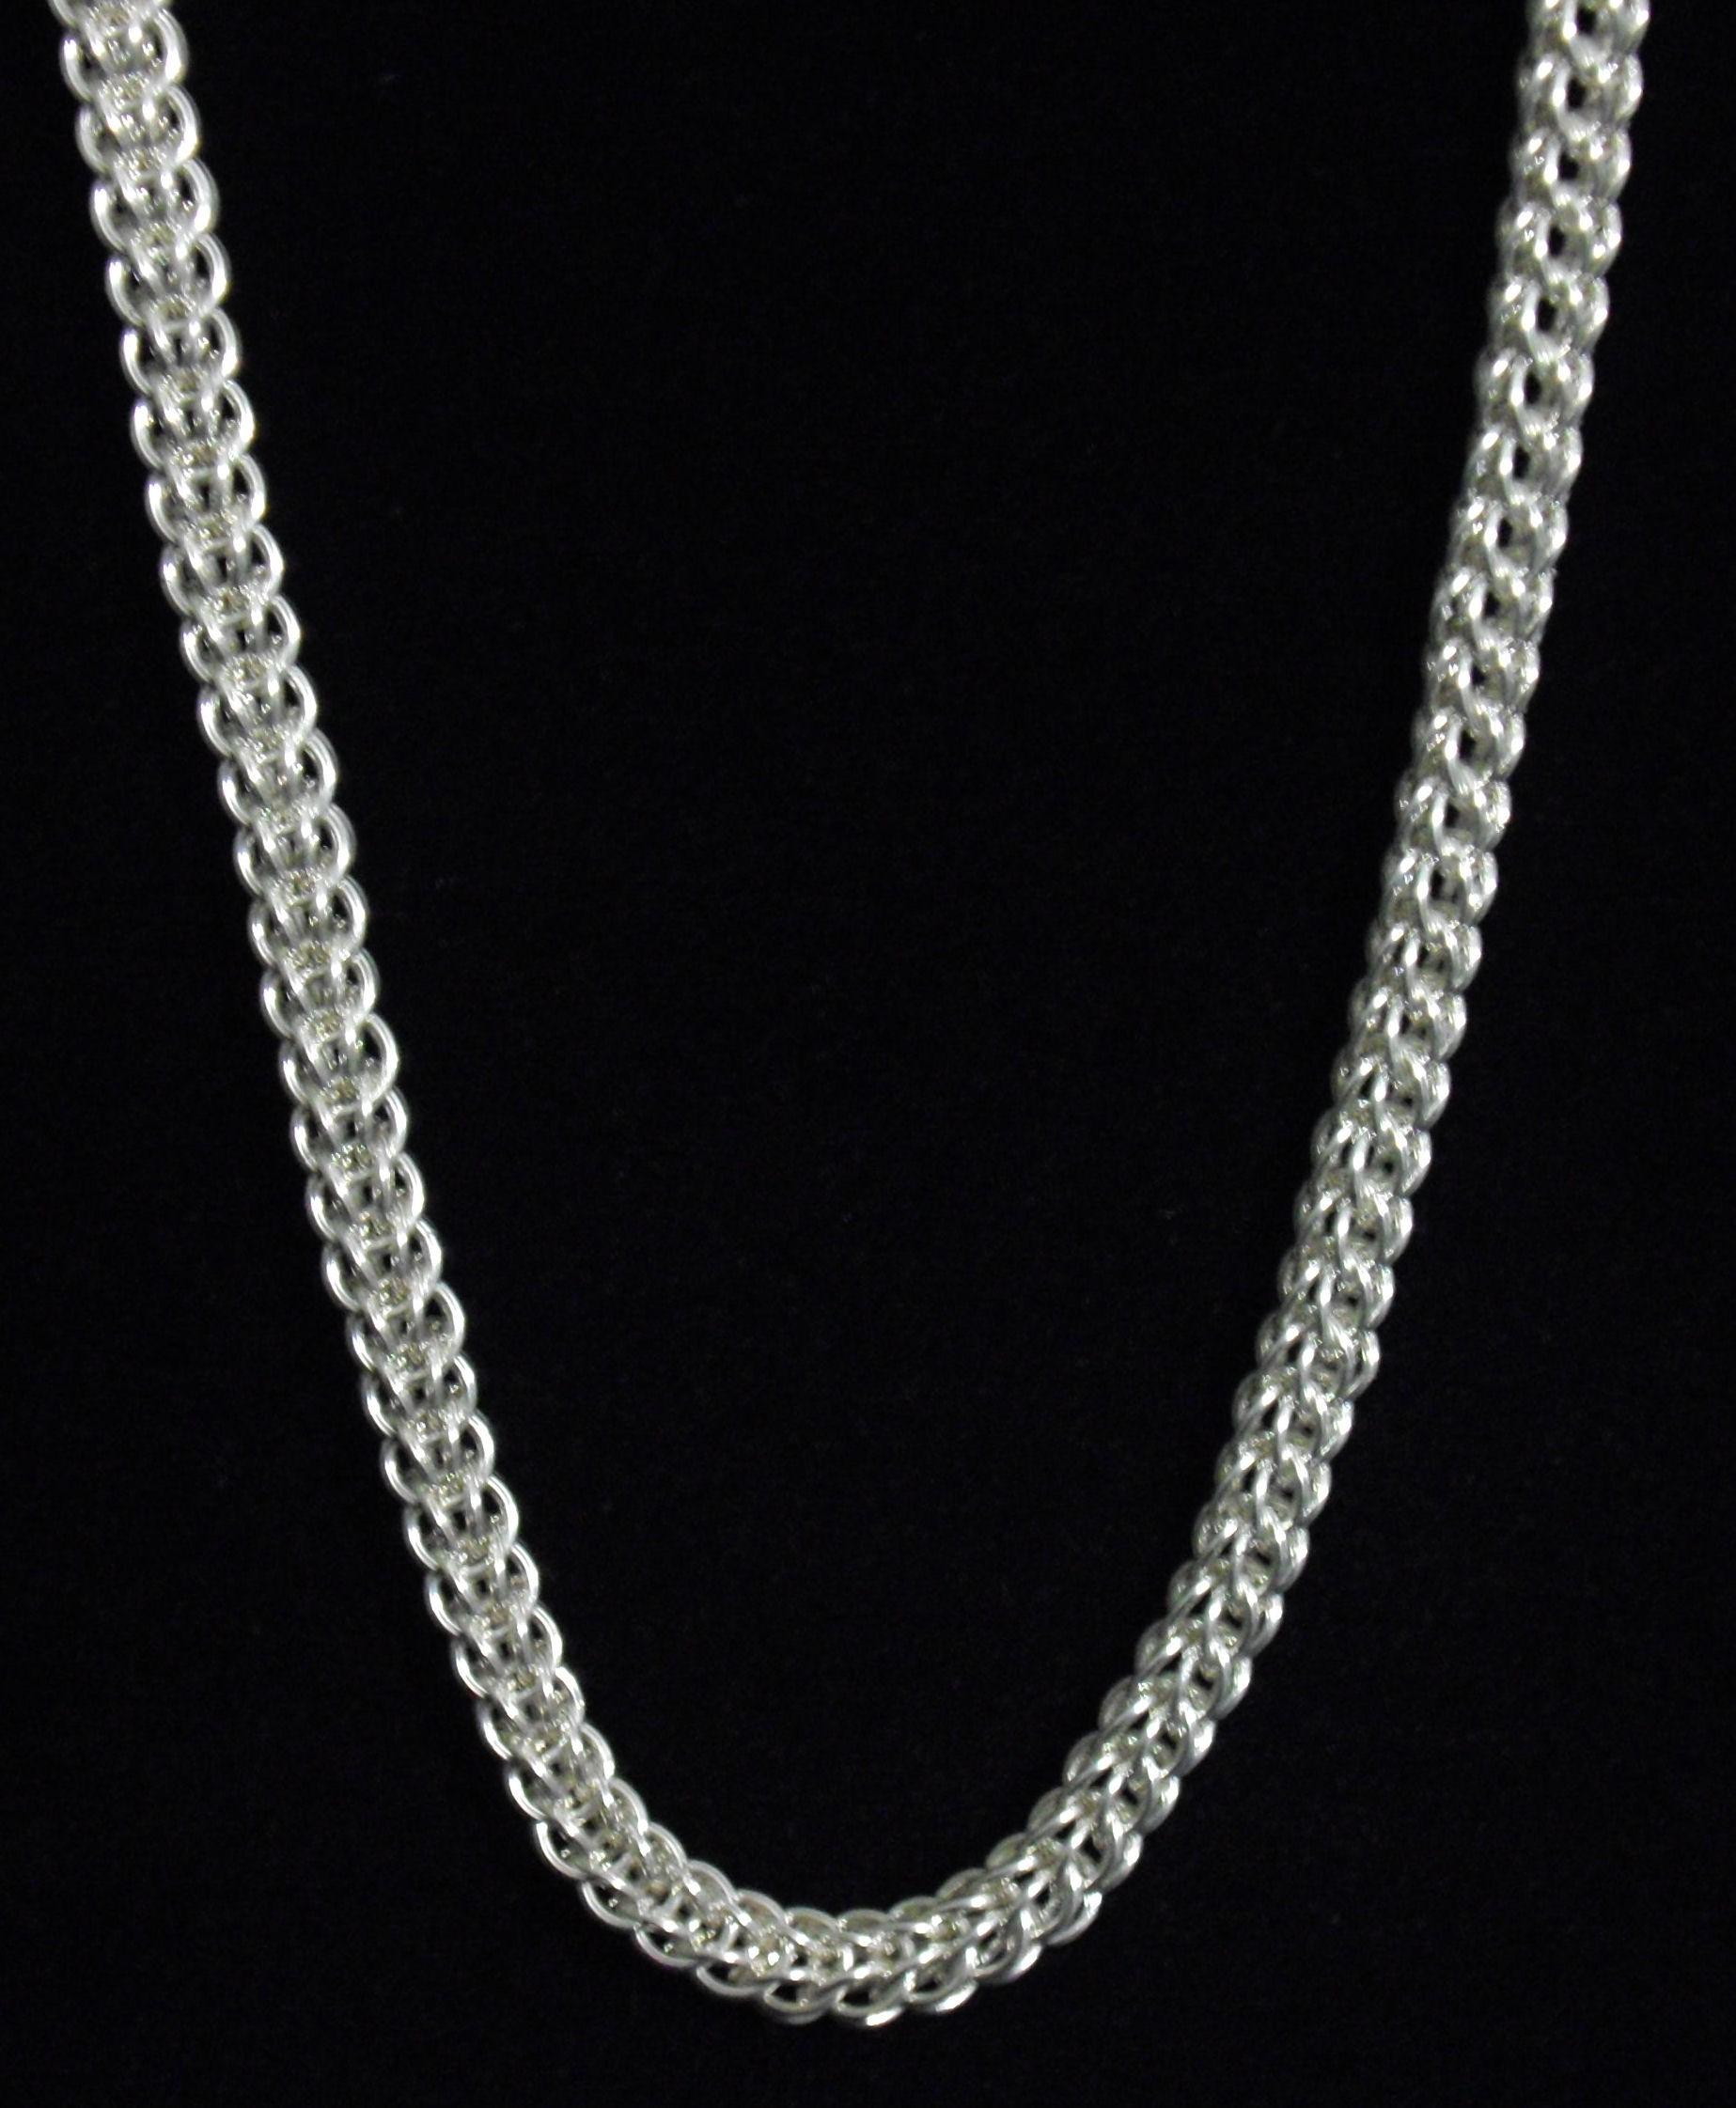 Full Persian Necklace Kit